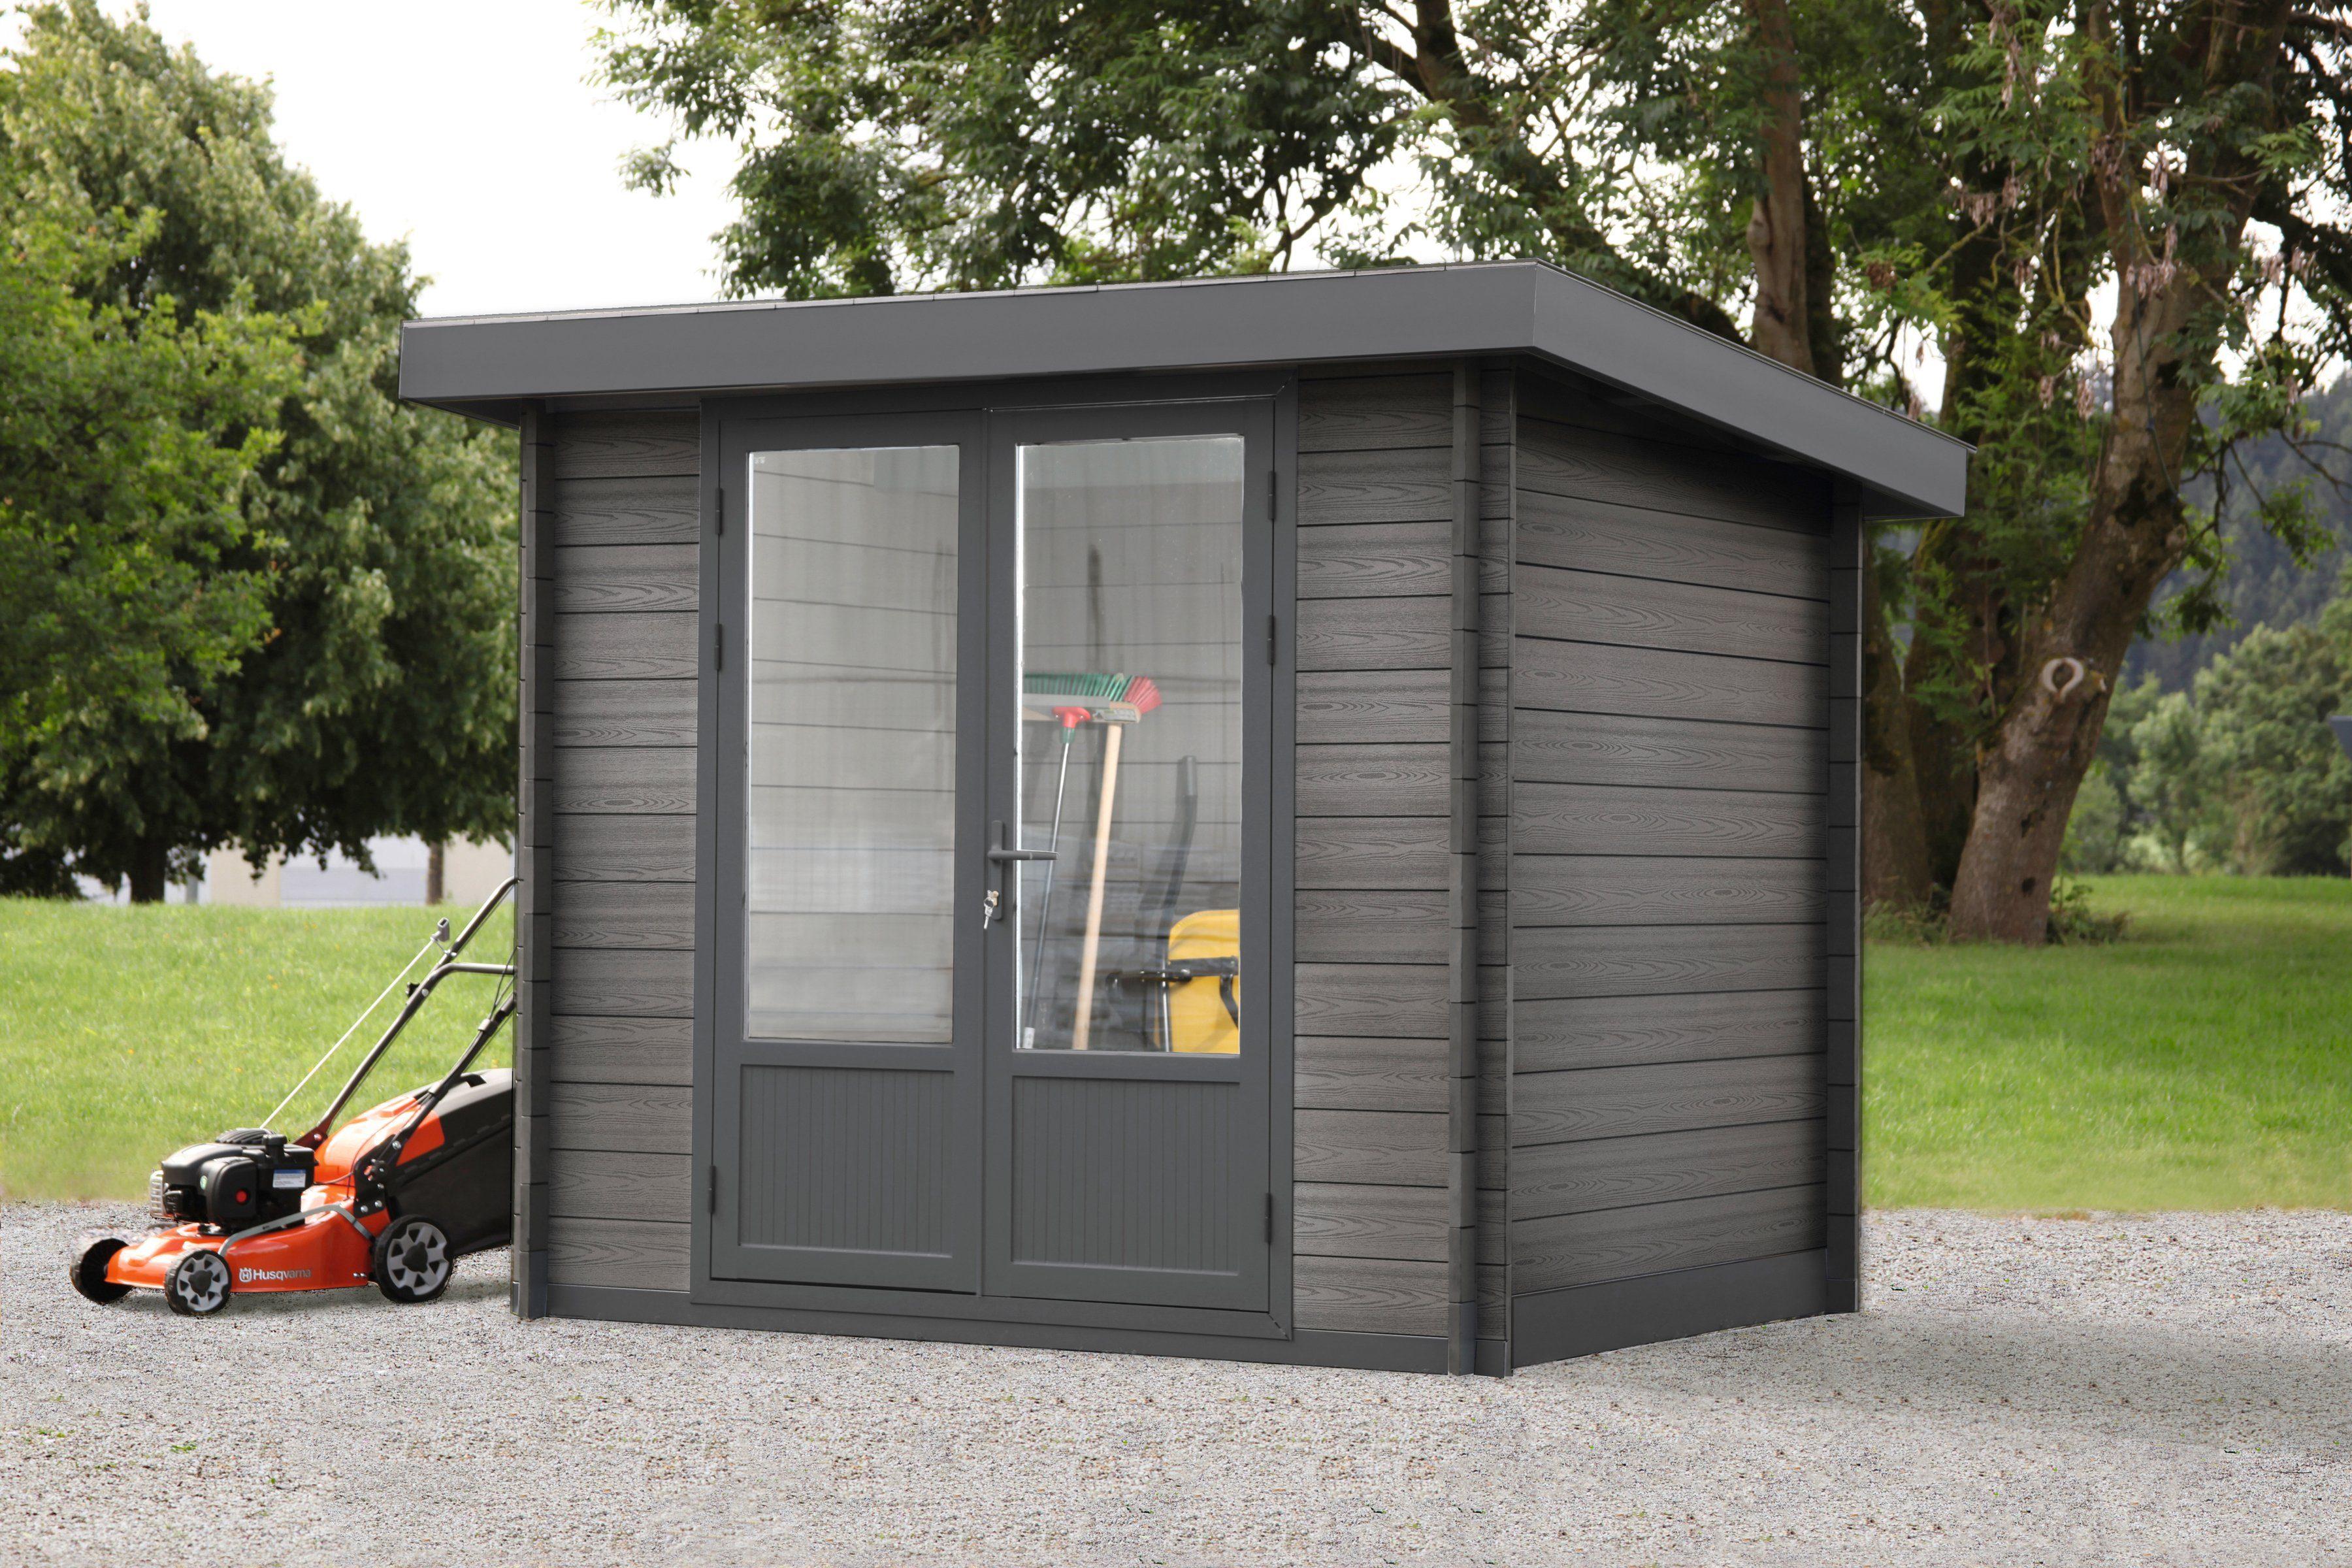 WOLFF Gartenhaus »WPC-Trend grau«, BxT: 234x187 cm